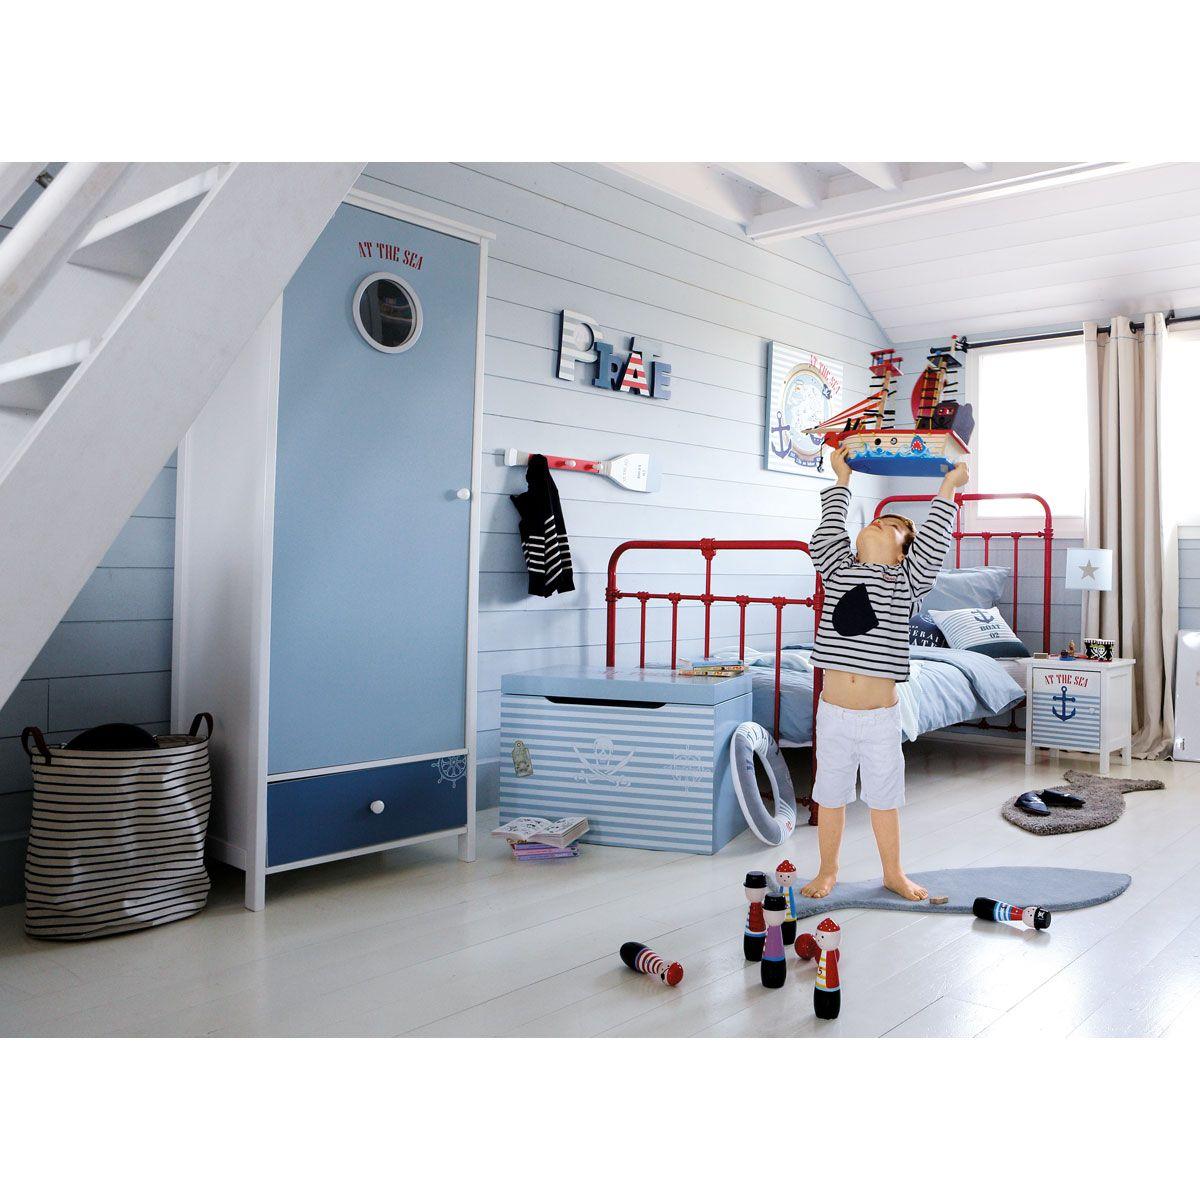 Chambre Pirate Maison Du Monde enfants   chambre enfant, deco chambre enfant et inspiration